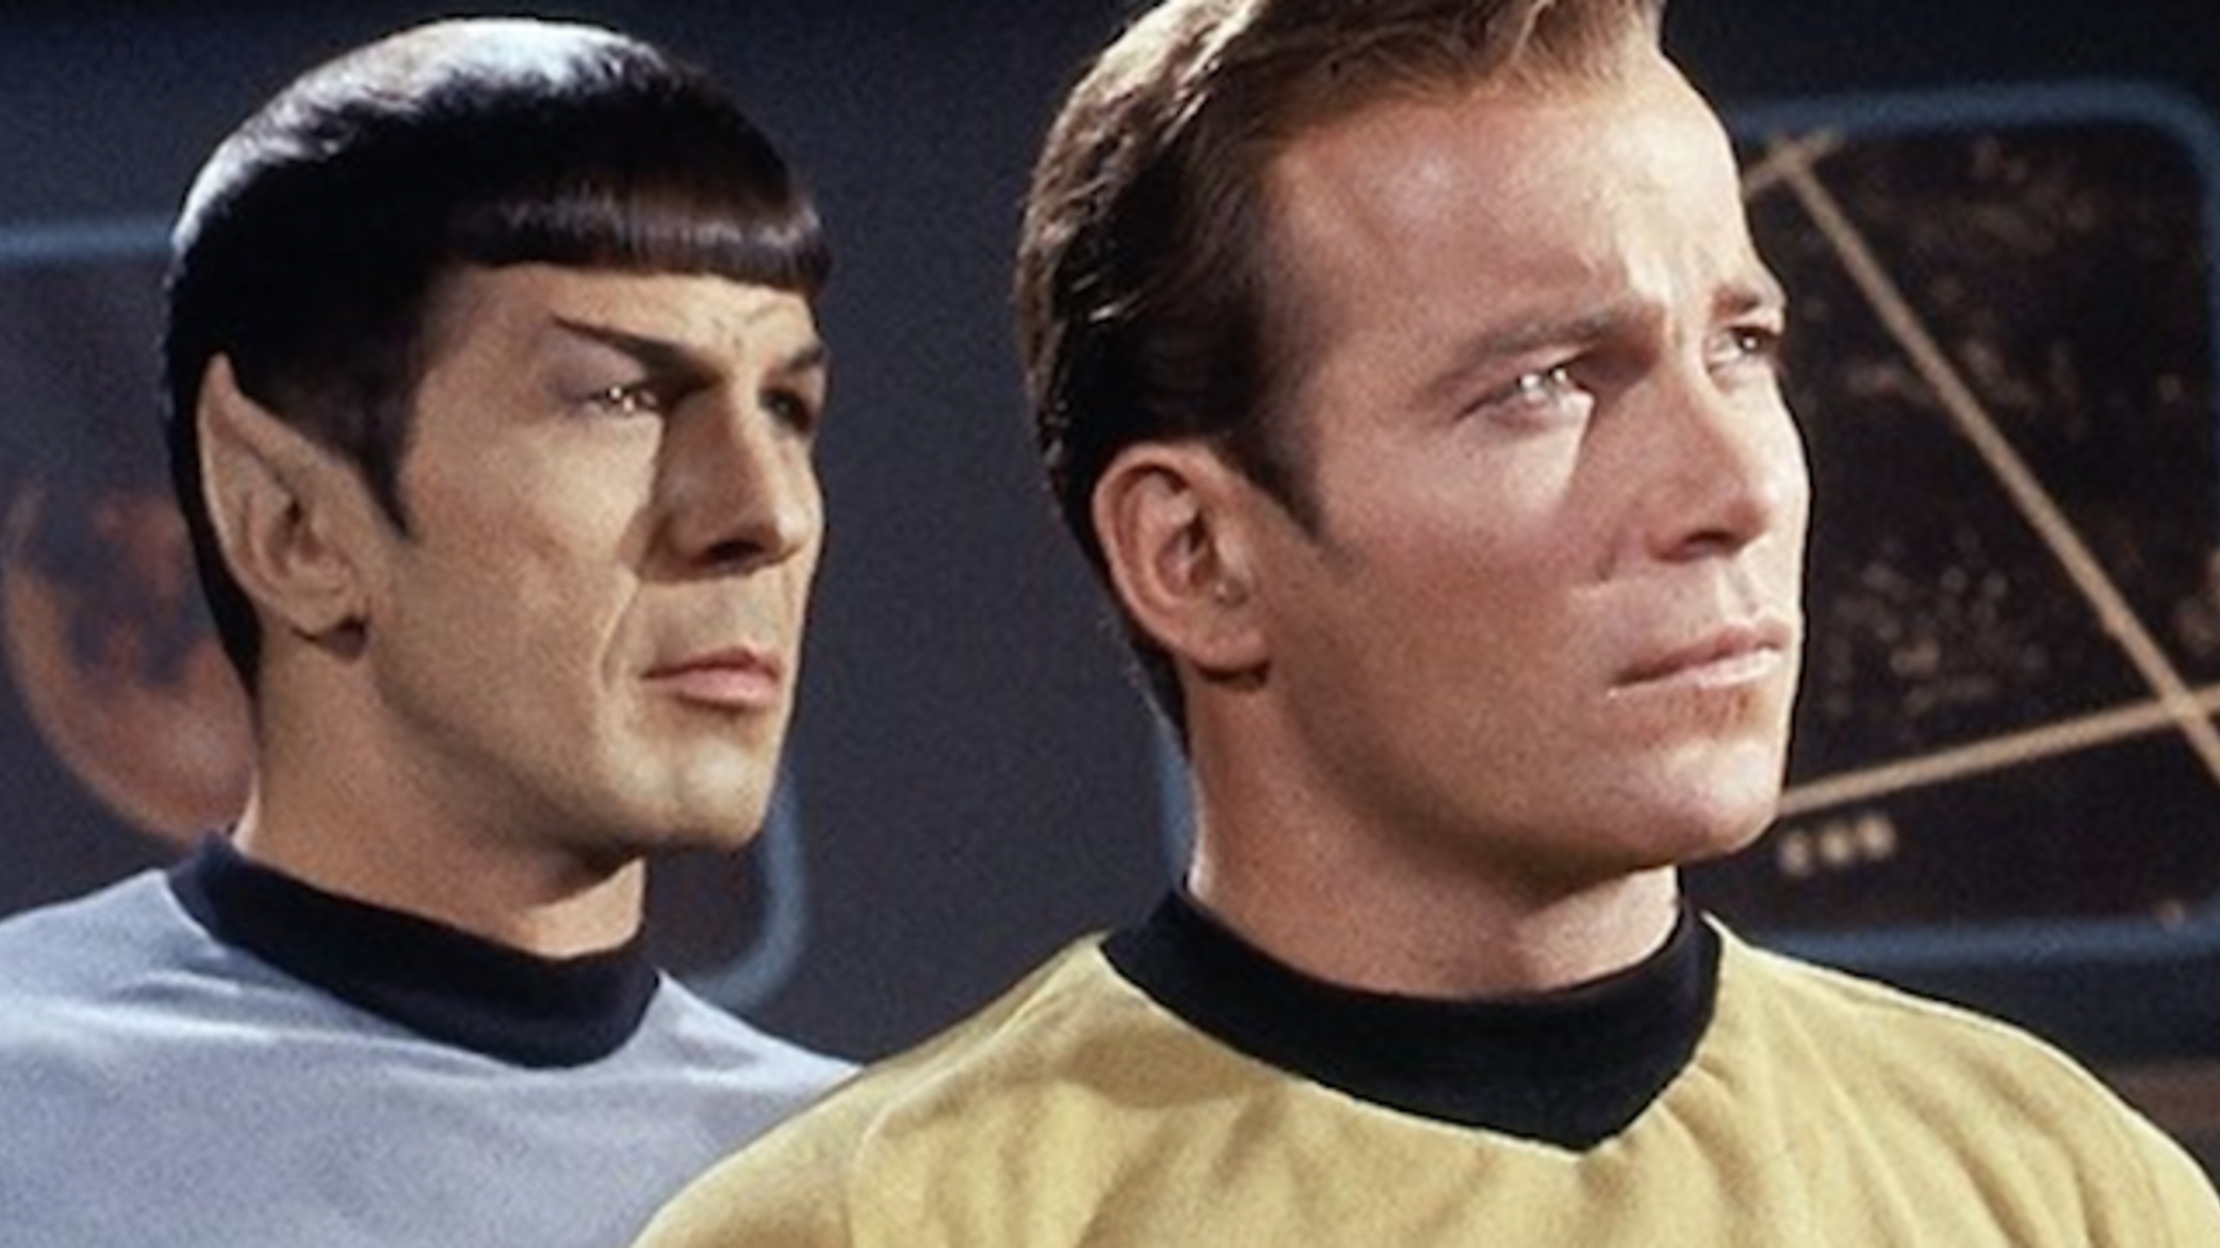 Star Trek TOS The Original Series Spock Blue Velour Shirt Uniform Costume Great